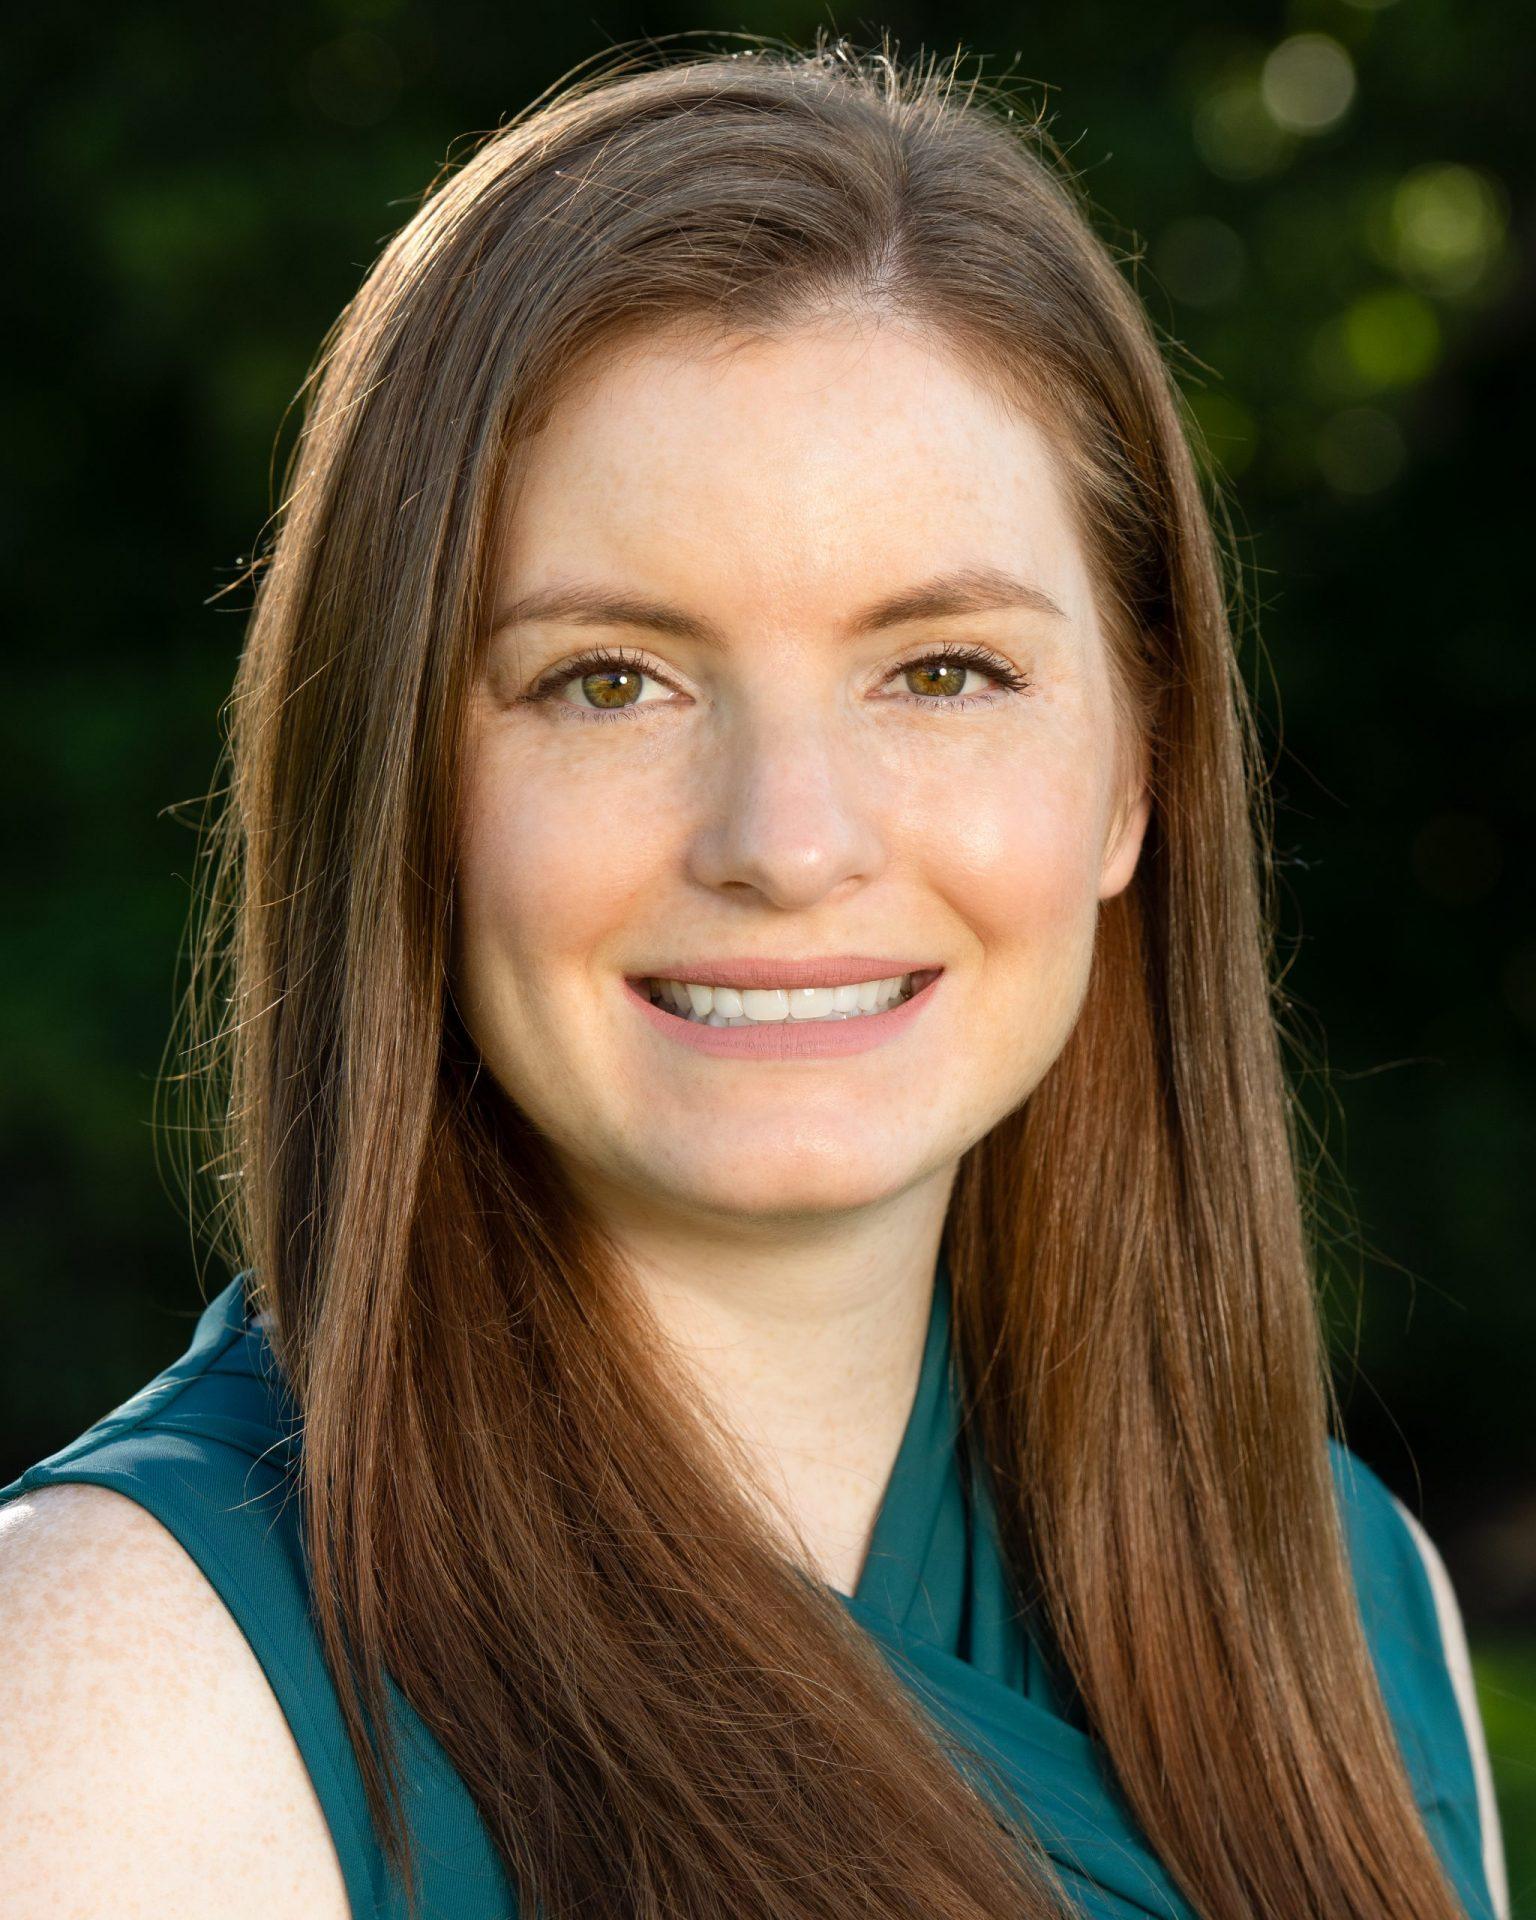 Dentist Dr. Adrienne Kebodeaux headshot